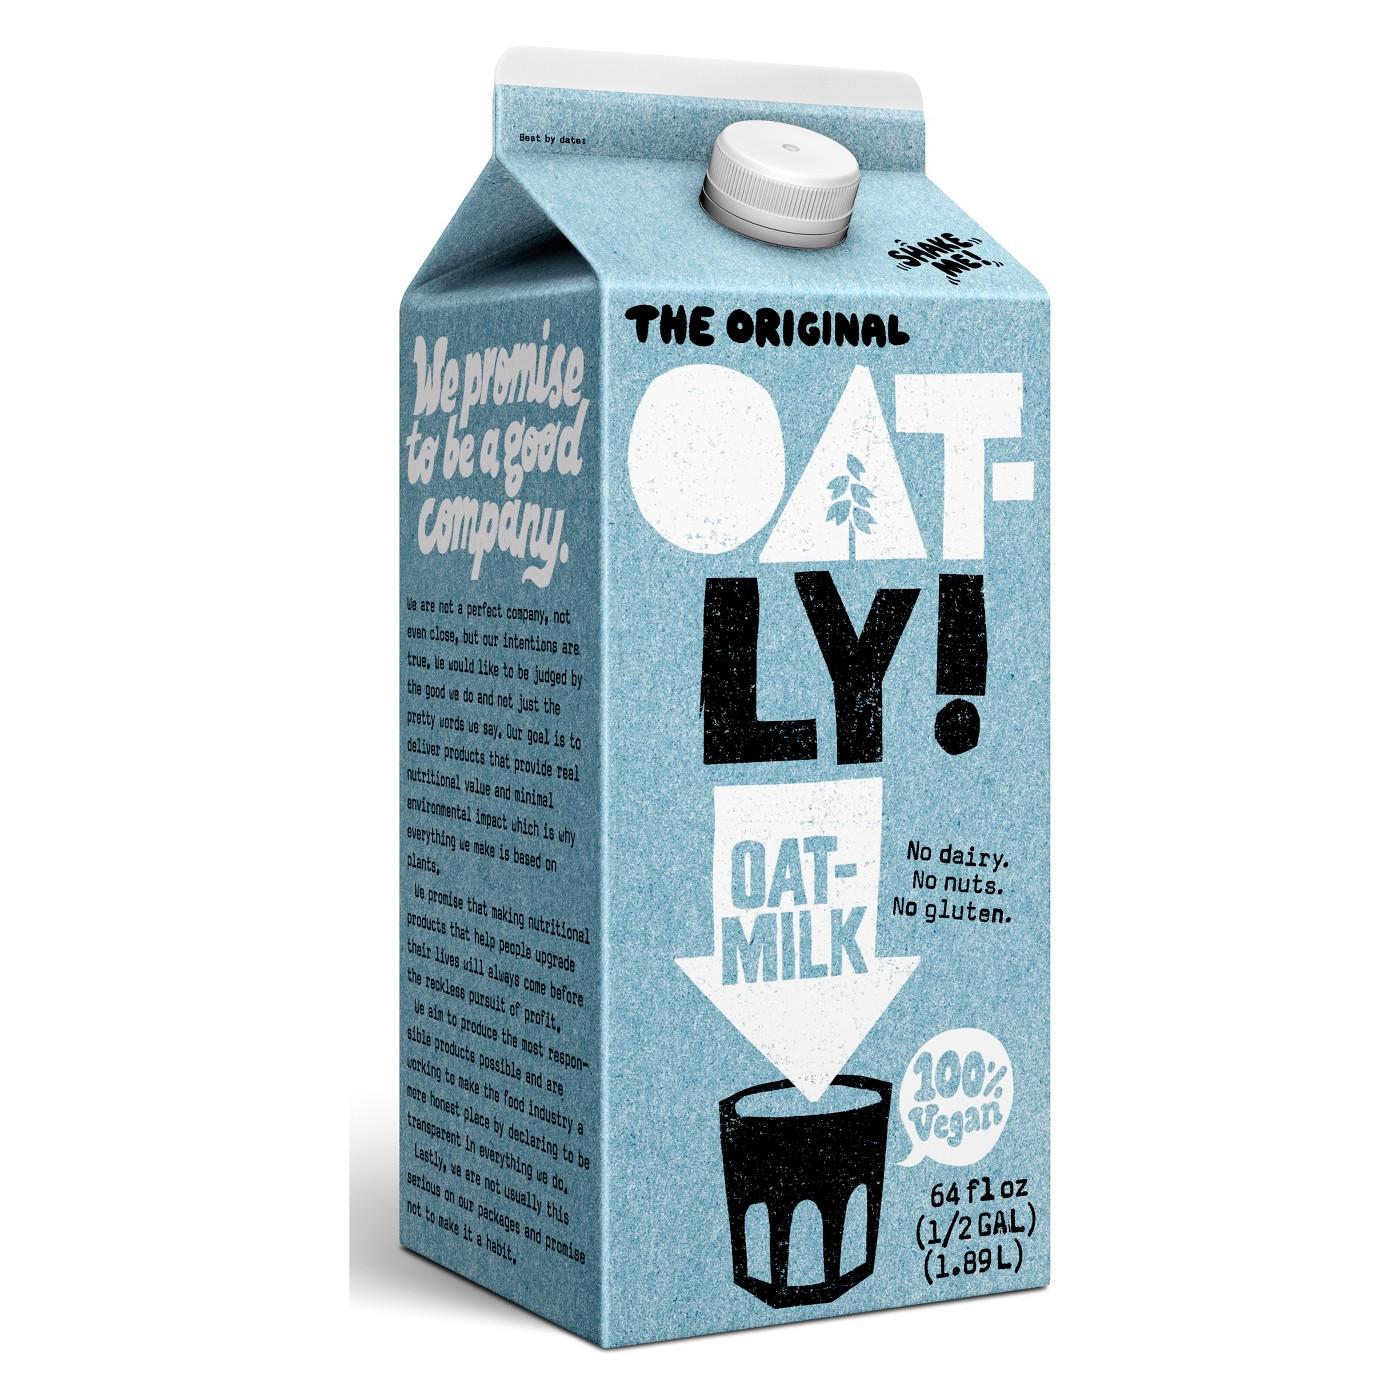 OATLY! Original Oat Milk - 0.5gal - image 1 of 1